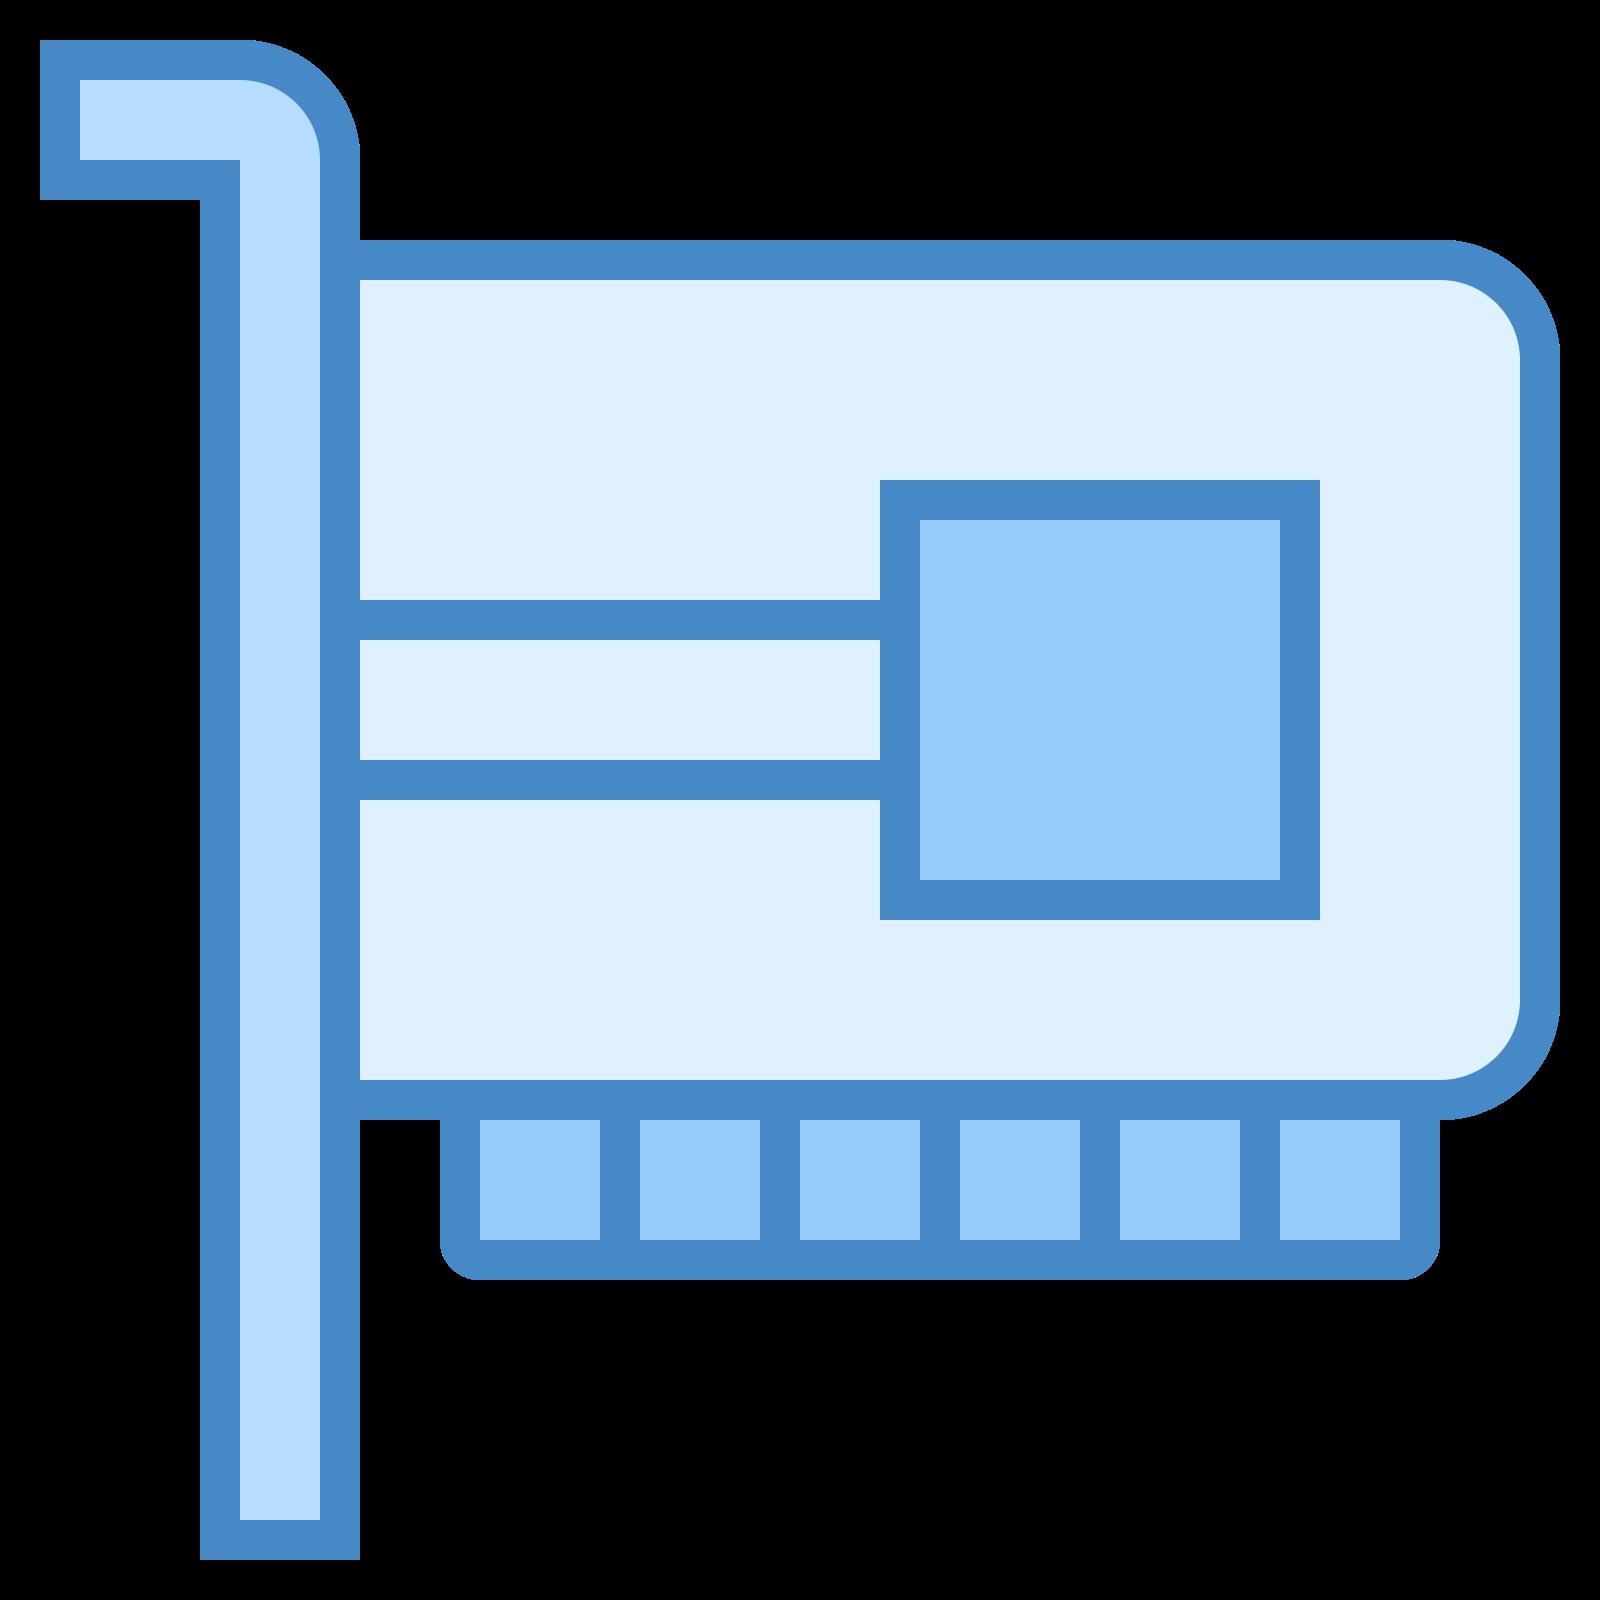 Karta sieciowa icon